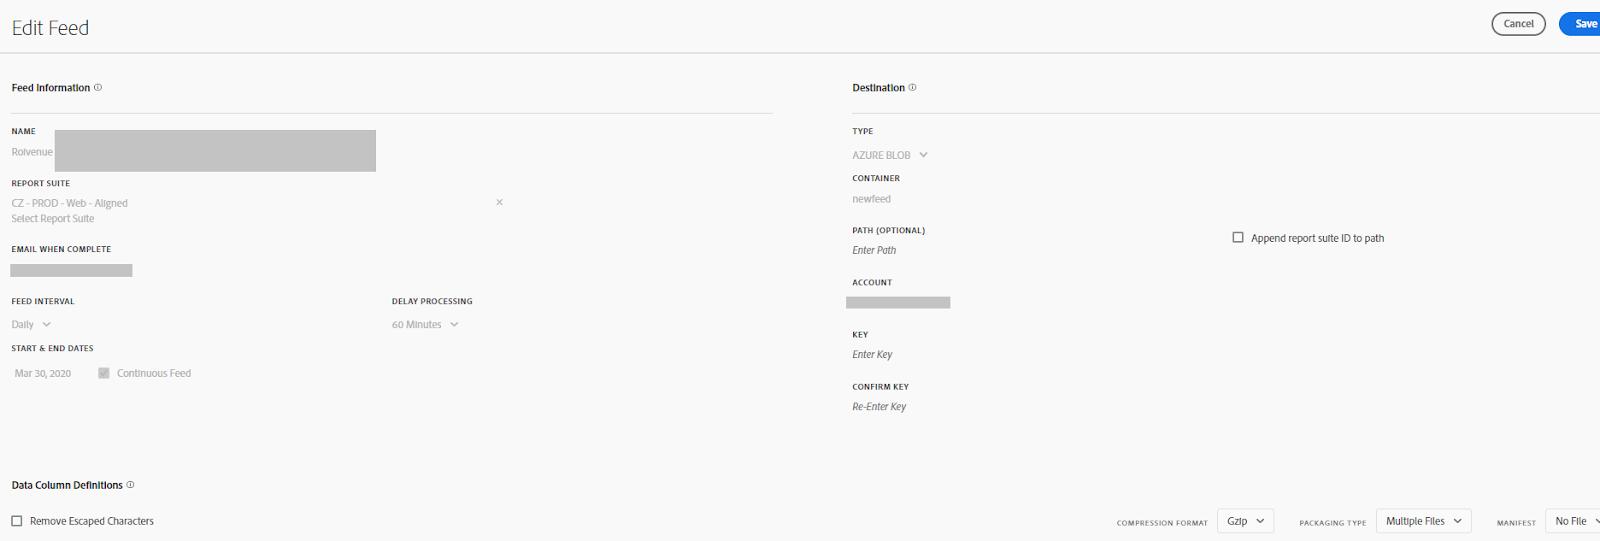 Settings of Adobe Analytics Export to Azure Blob Storage